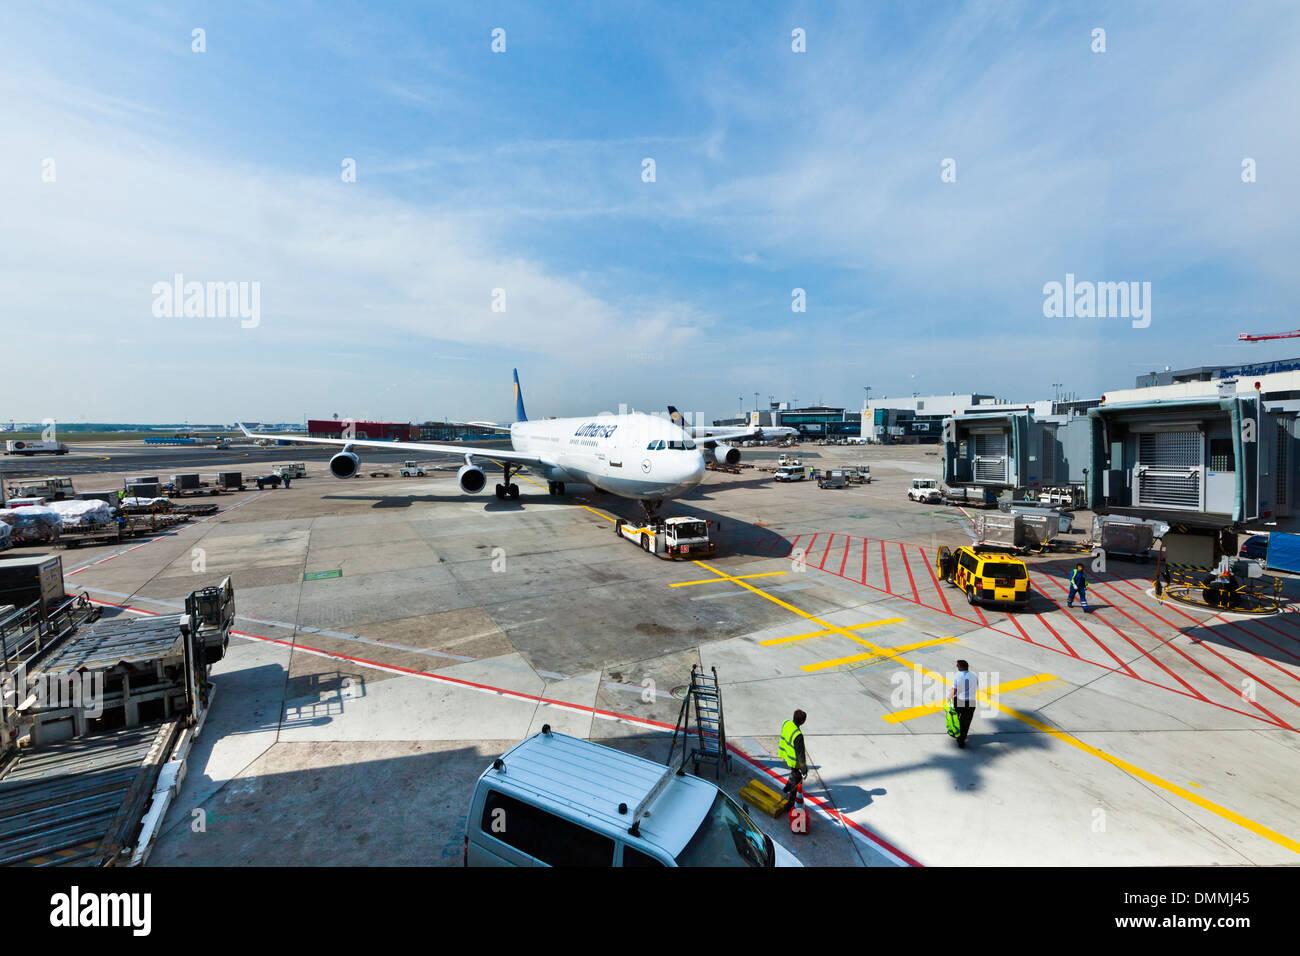 Germany, Frankfurt, Airport, Airbus A340 of Lufthansa - Stock Image